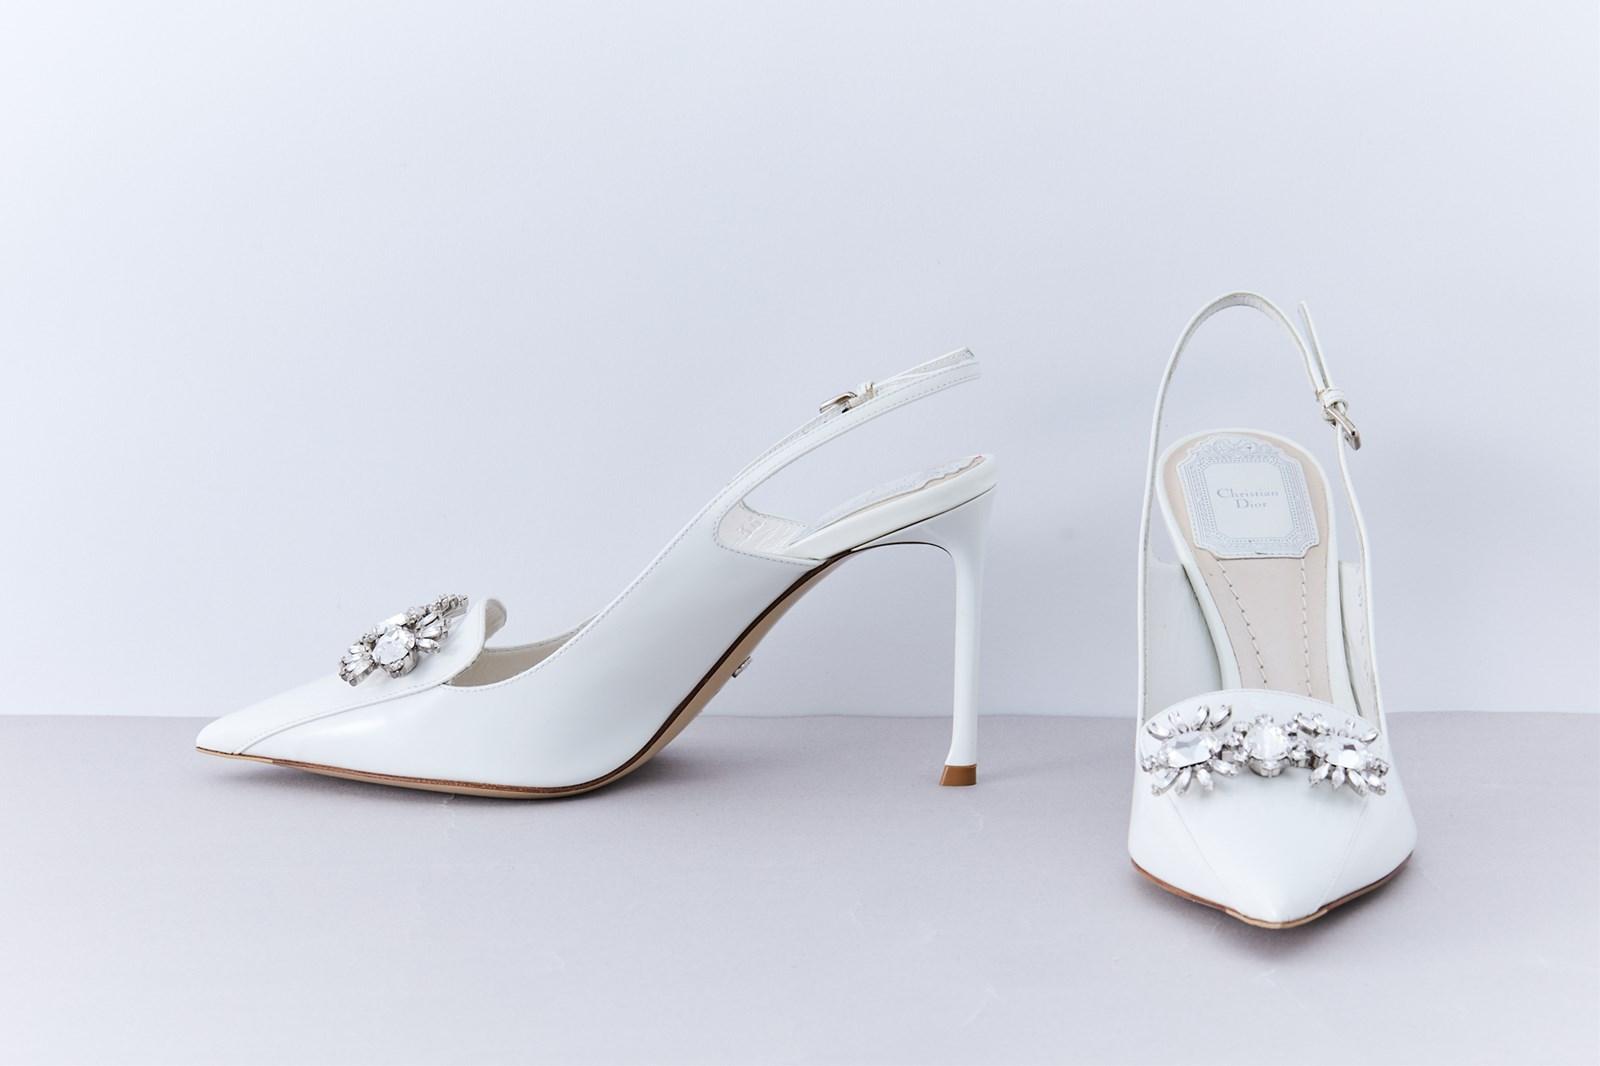 SH555963 Christian Dior 36.5